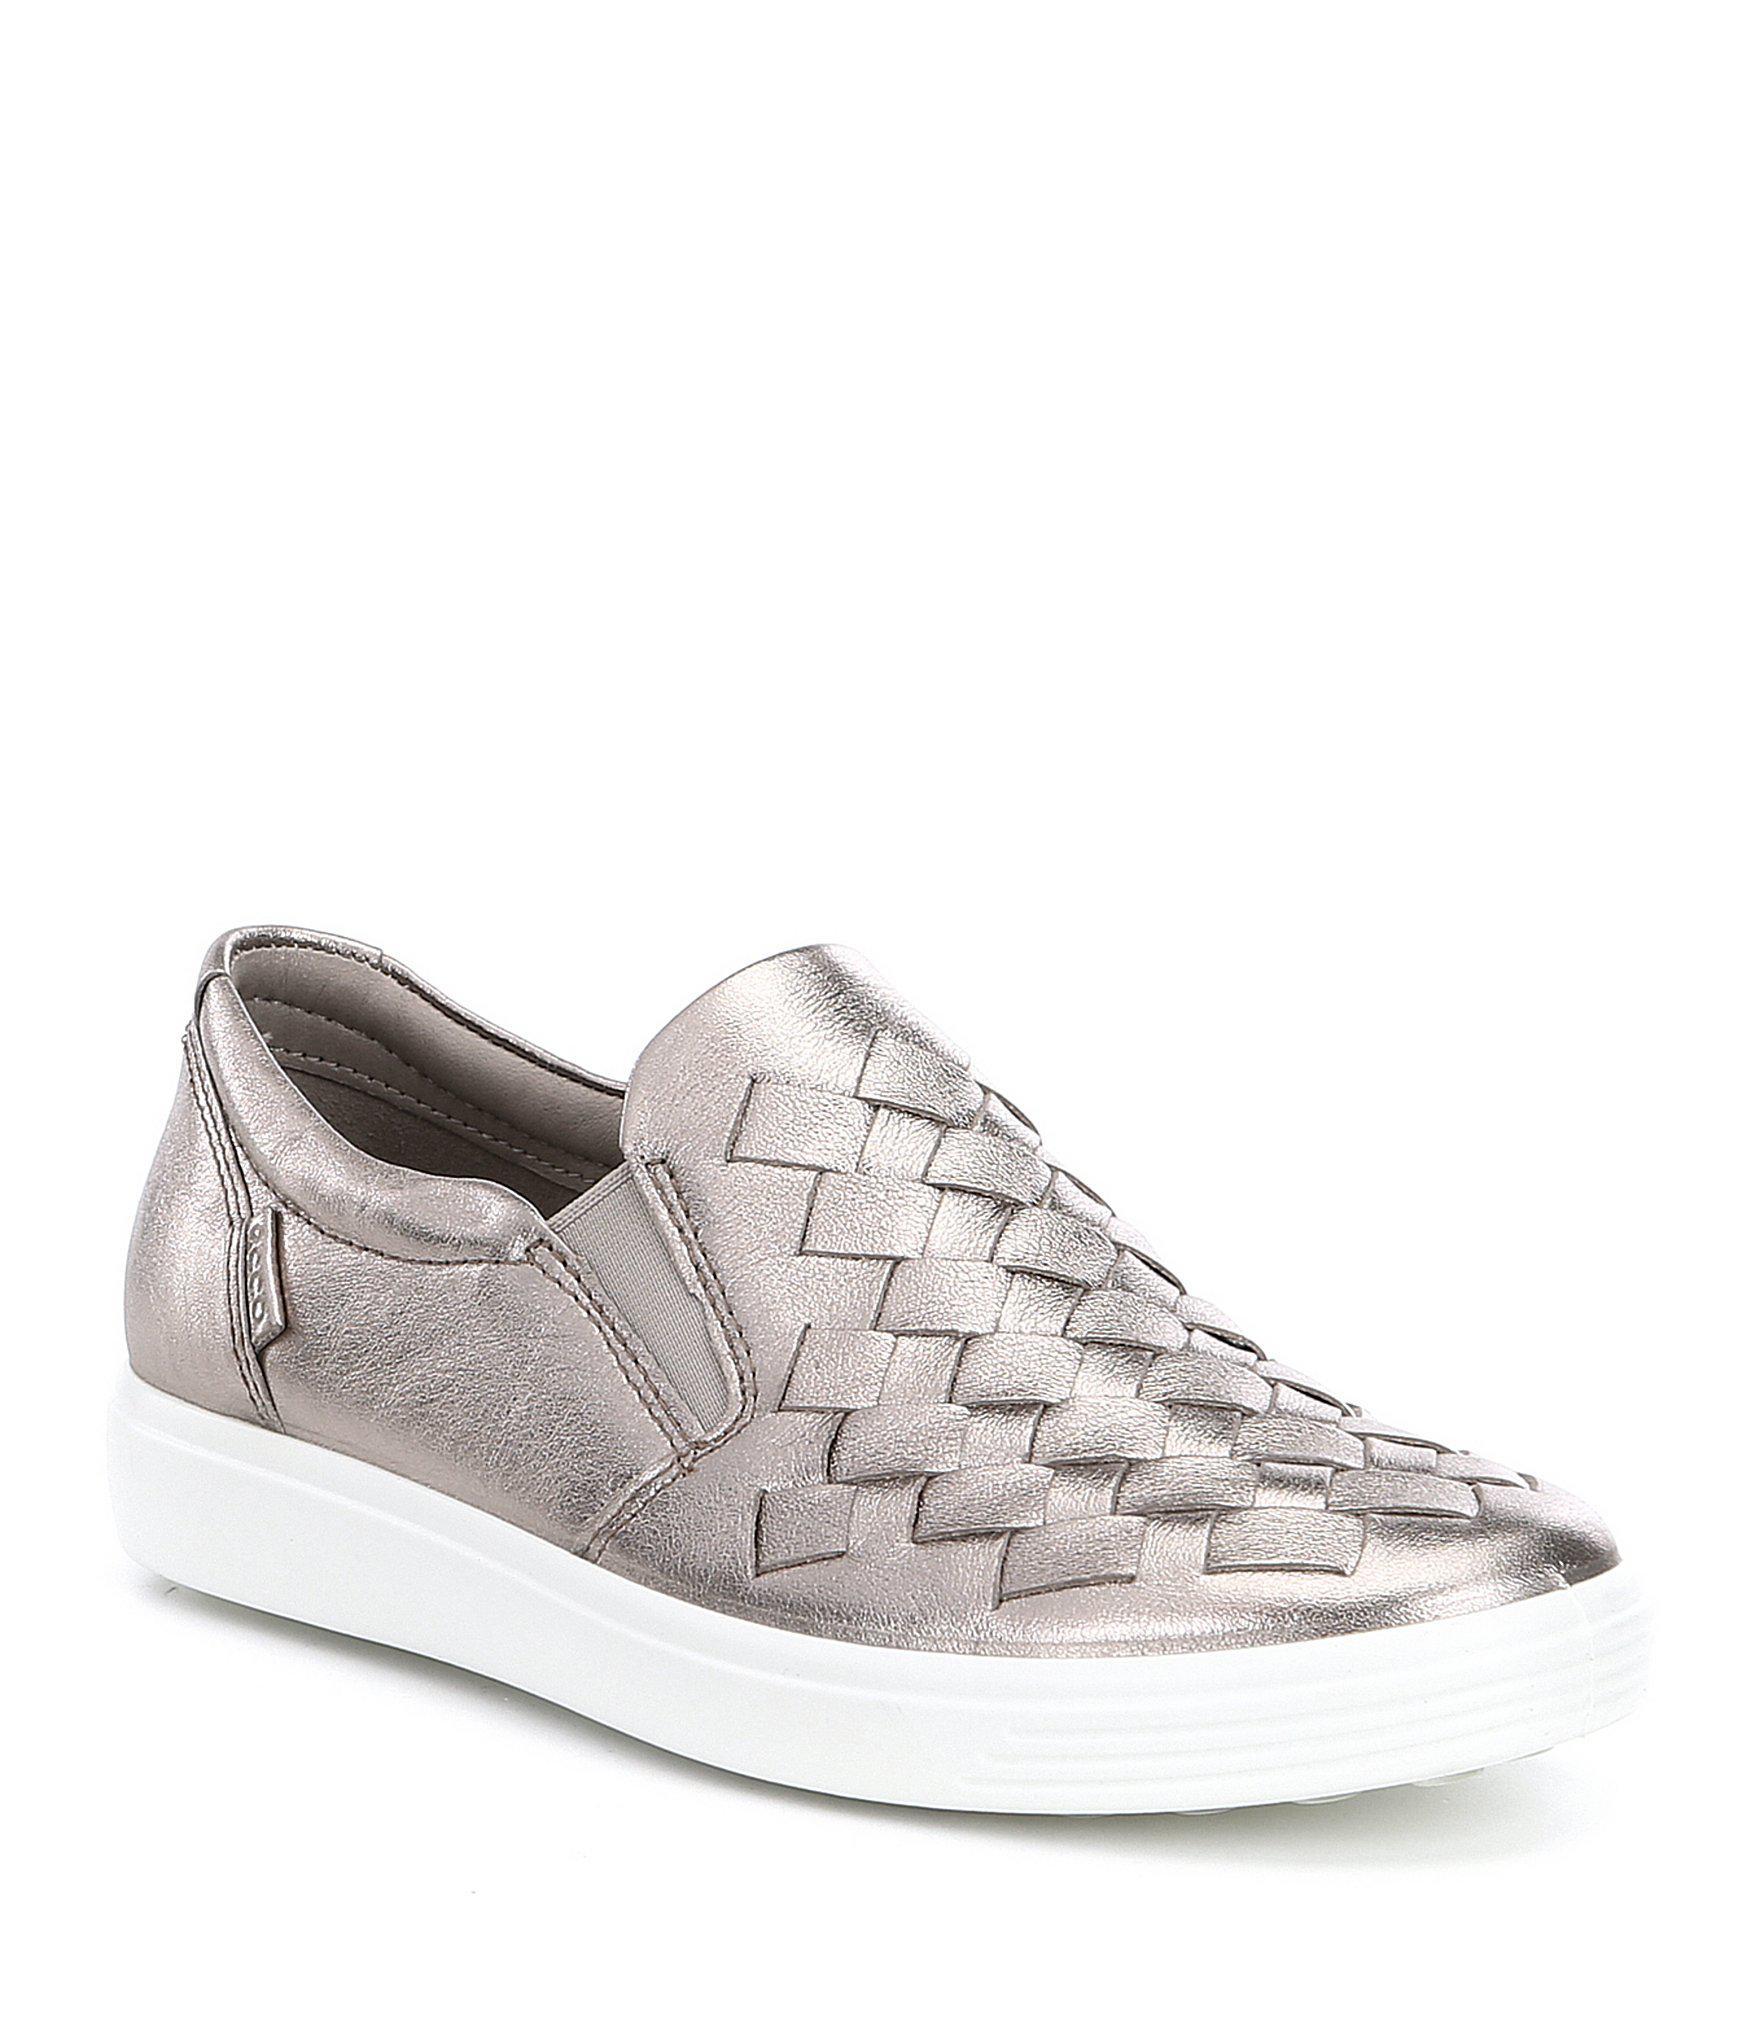 e735e53127d Lyst - Ecco Women s Soft 7 Woven Slip-on Sneakers in Black